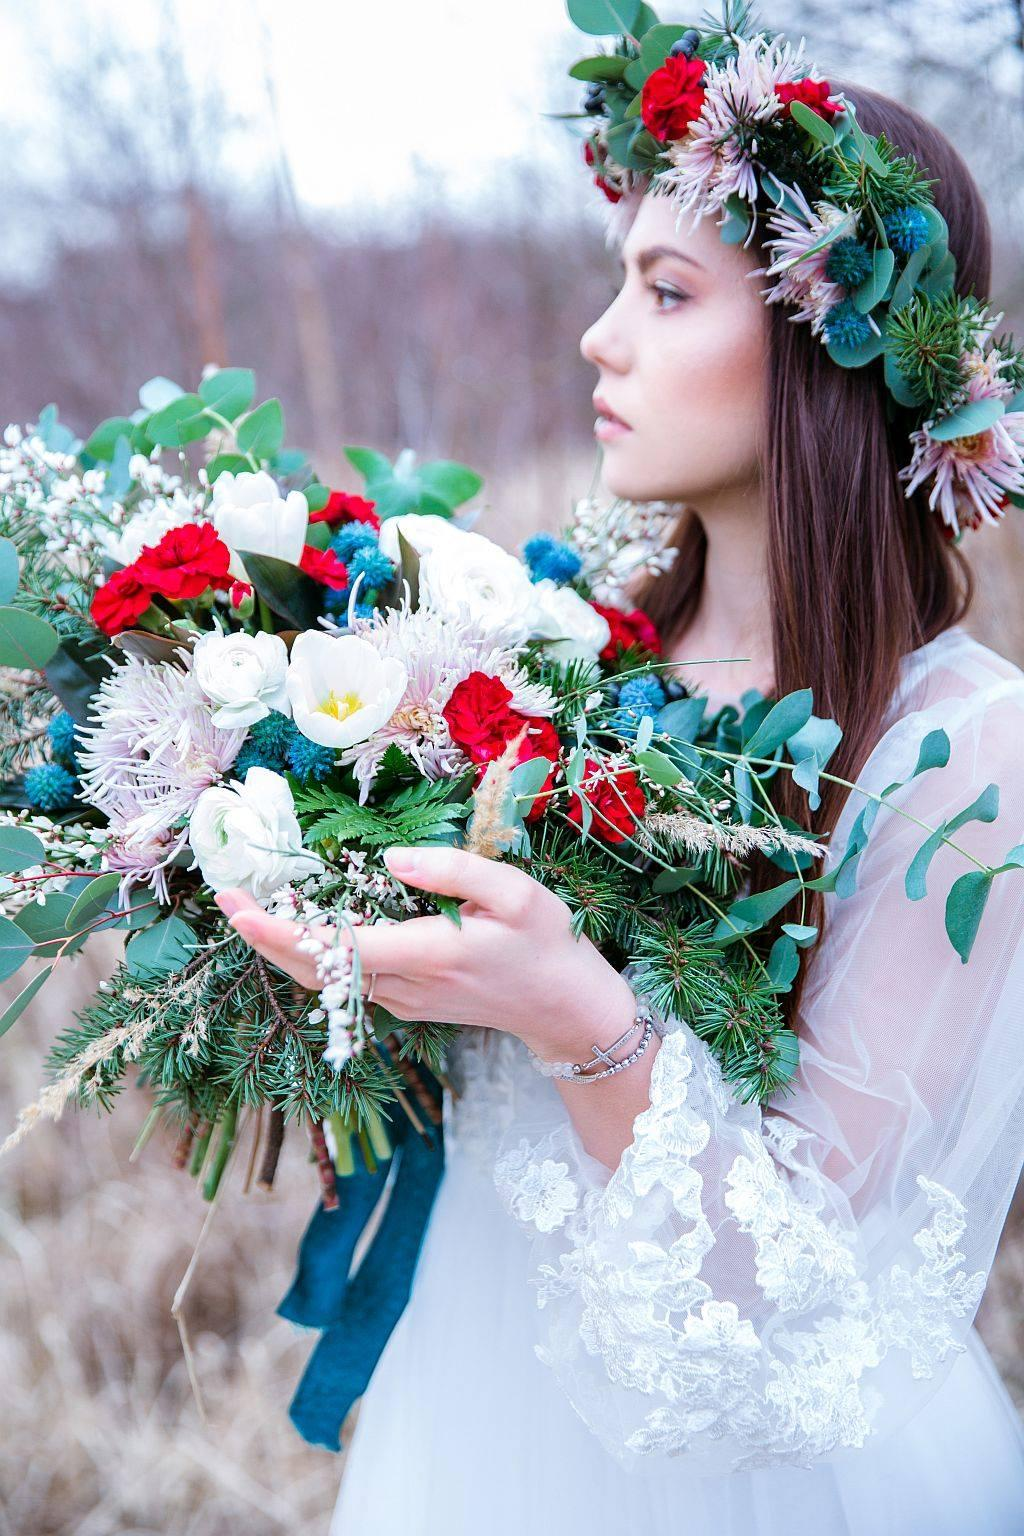 Úžasný editorial v zimě-jarním kabátu - Foto: Simona Velkoborská, květiny: Rozkvetlá dílna, šaty: Mia Bella